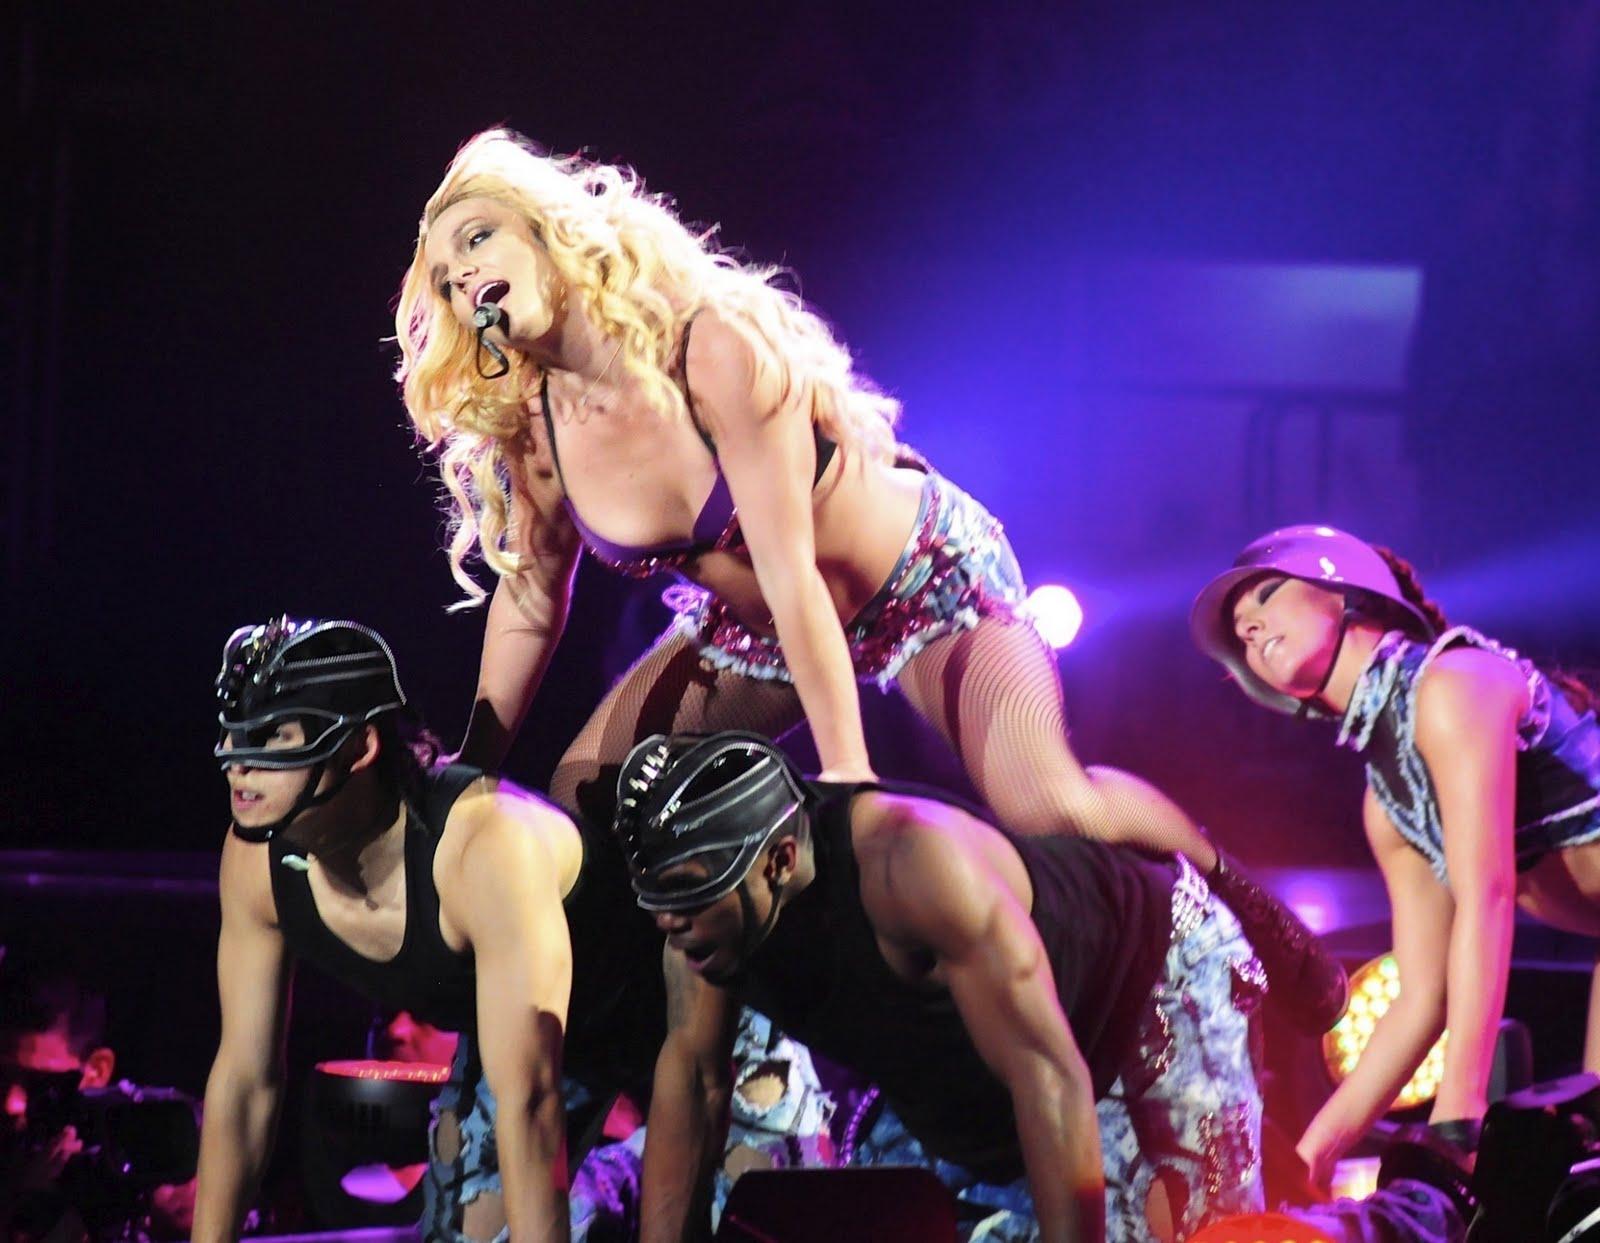 http://4.bp.blogspot.com/--TaYltNuPL8/TipM0kzhR_I/AAAAAAAADsI/5RvroEX9U-w/s1600/-Femme-Fatale-Tour-in-Los-Angeles-britney-spears-23098777-2060-1600.jpg